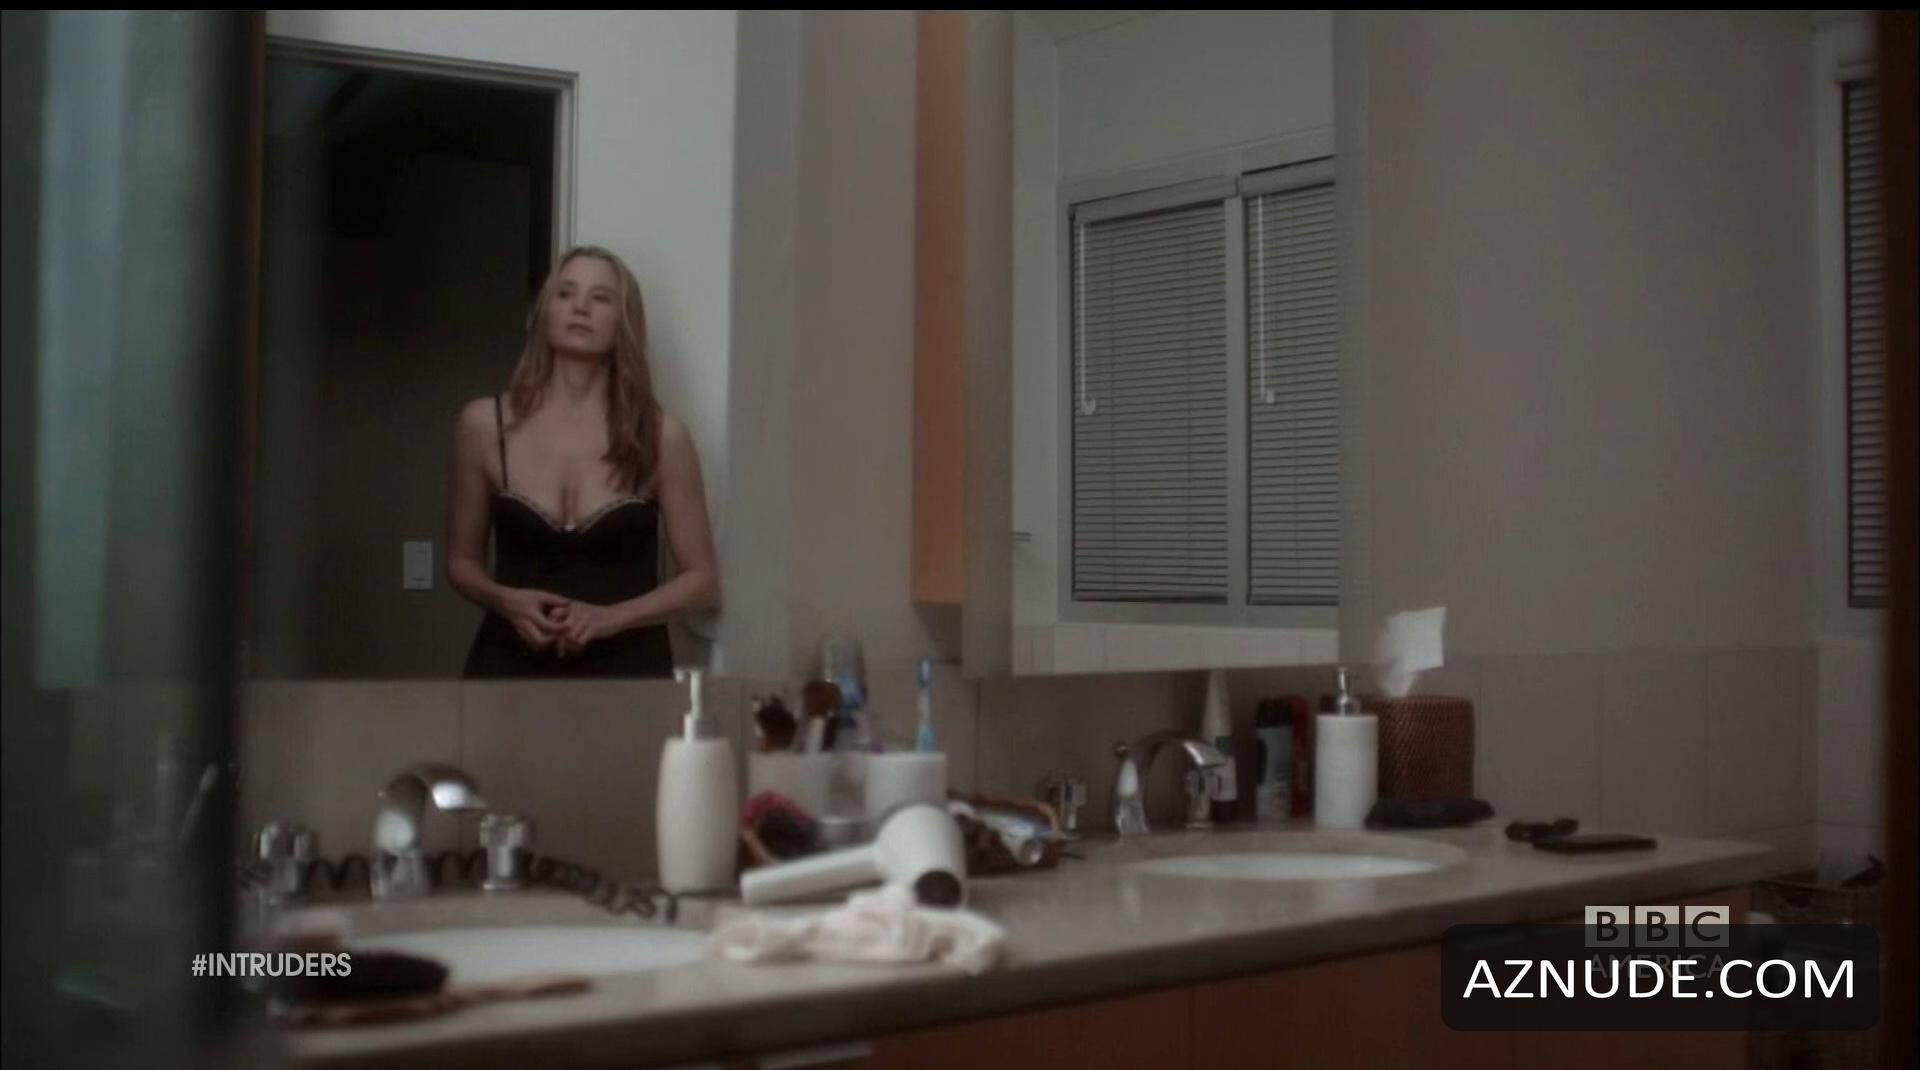 Nude video sorvino mira